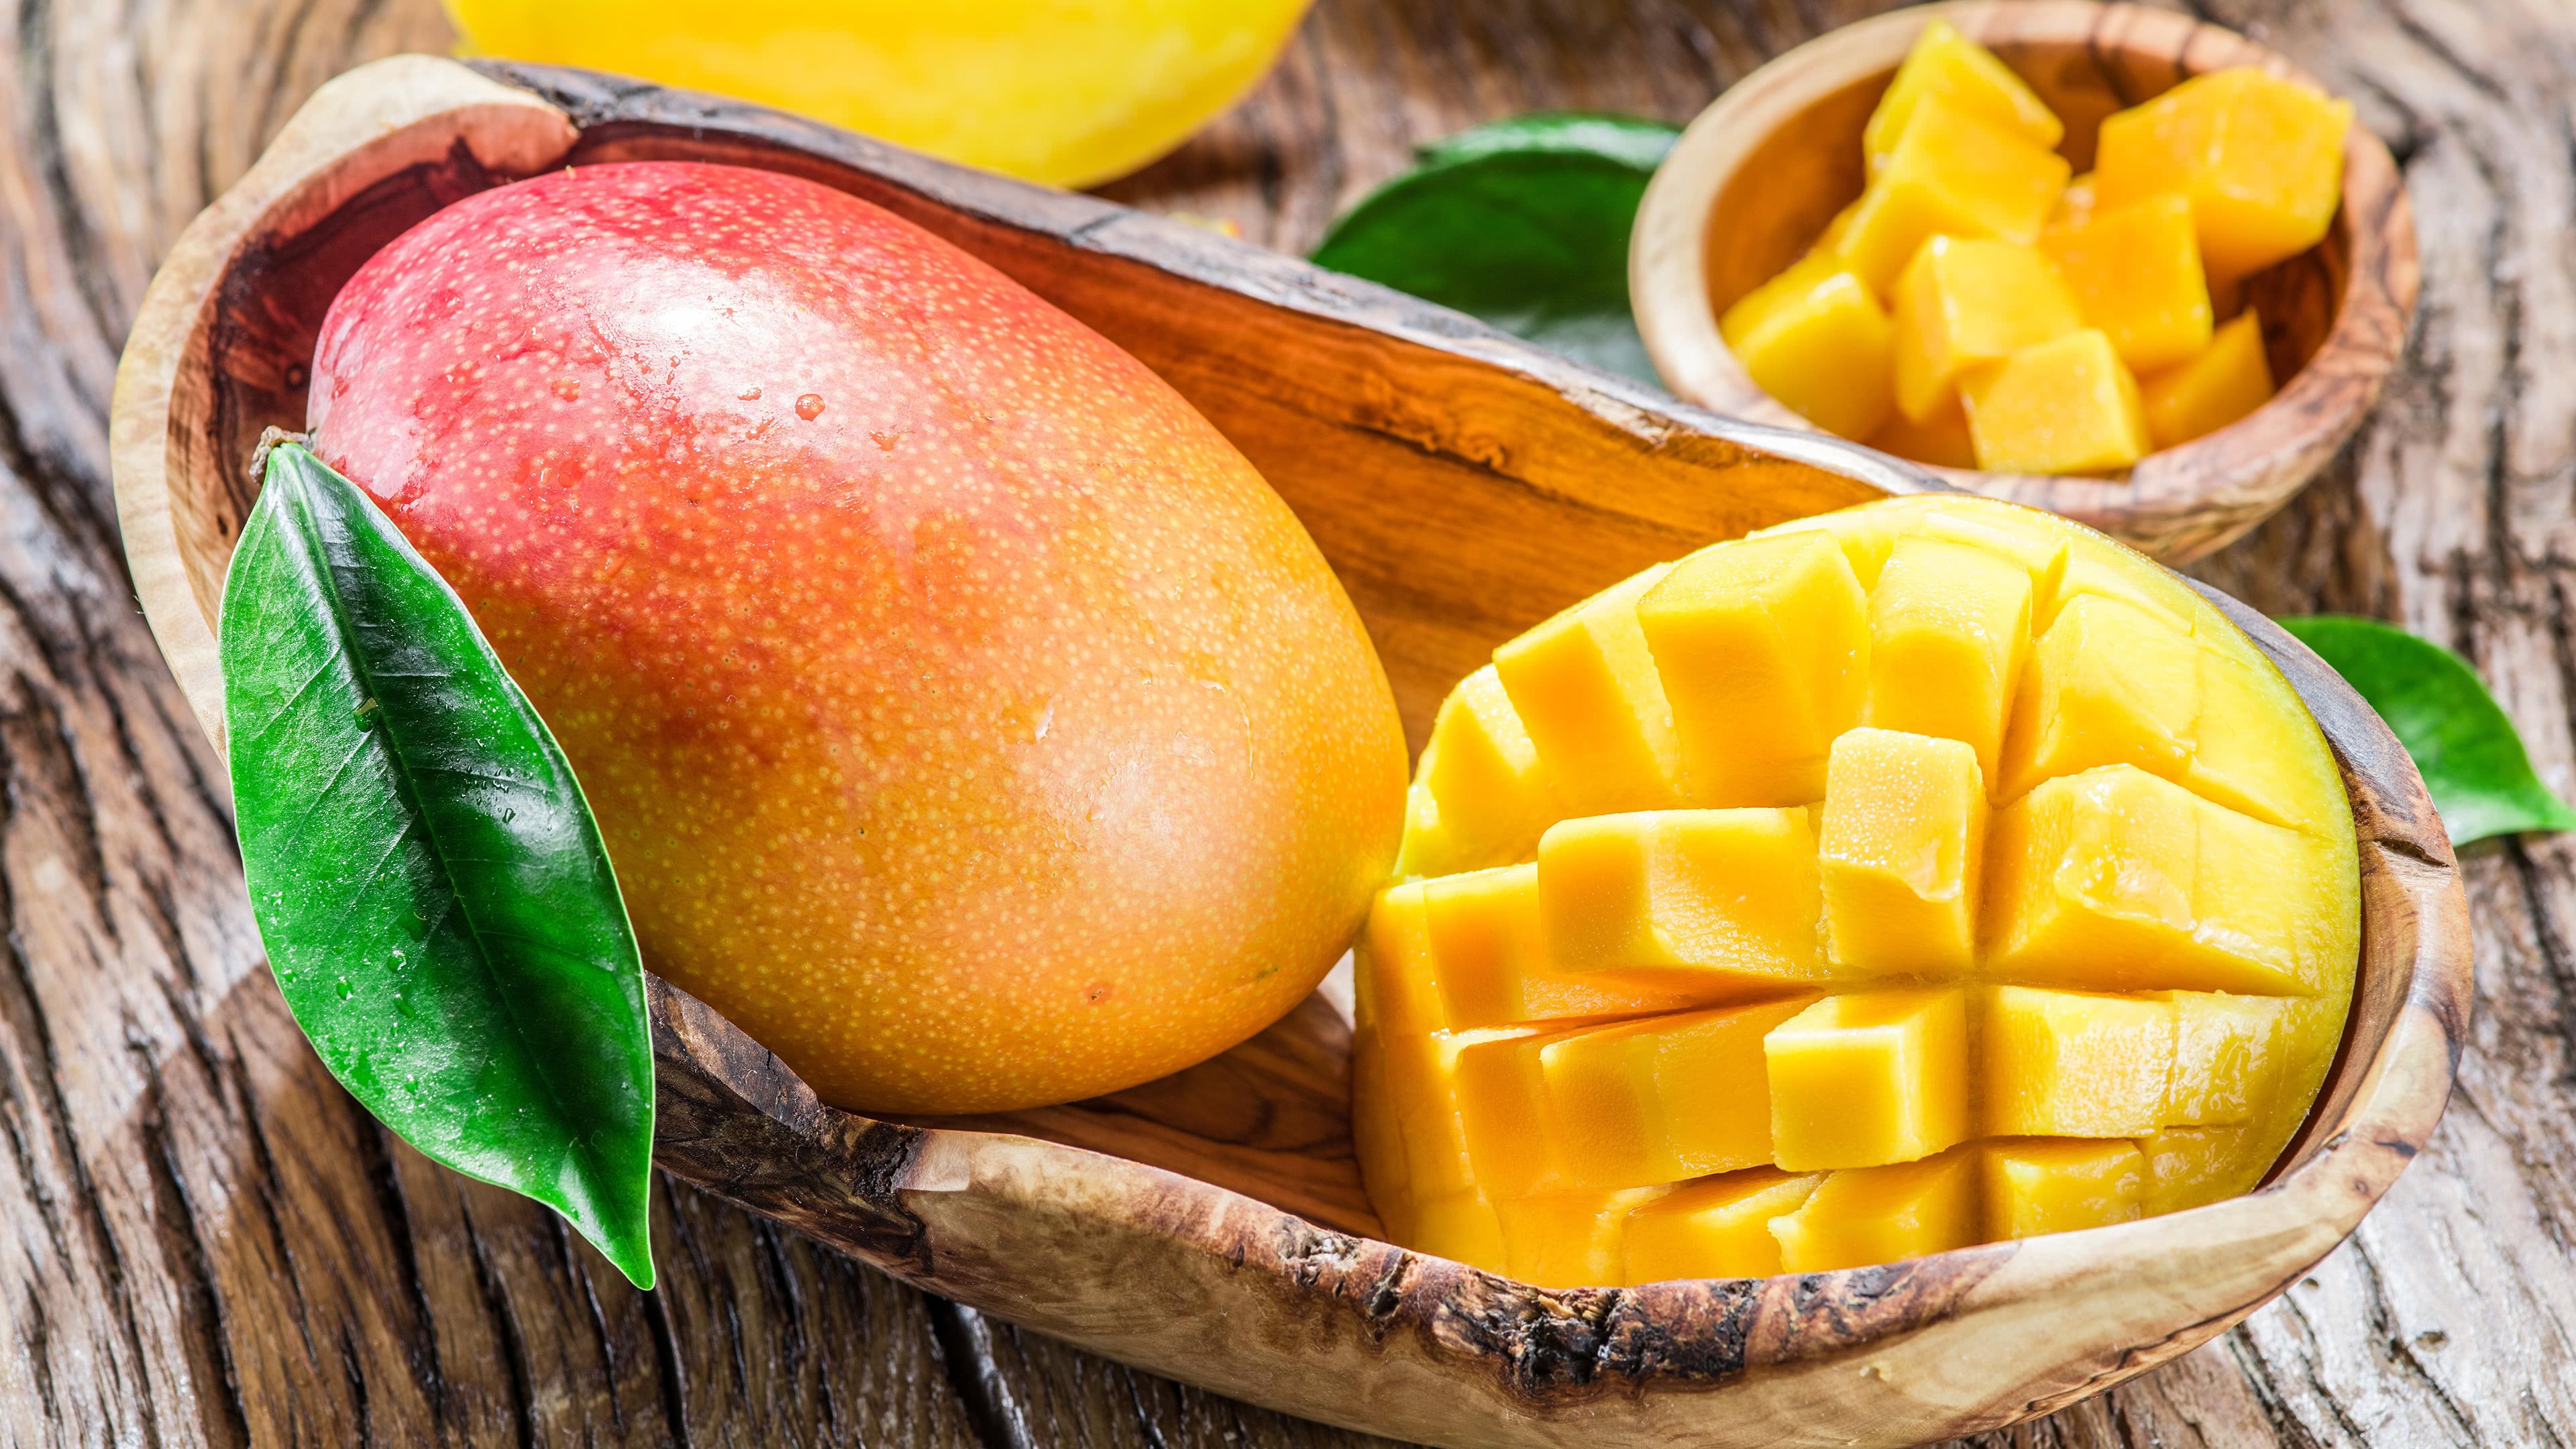 organic mangos uhd 4k wallpaper